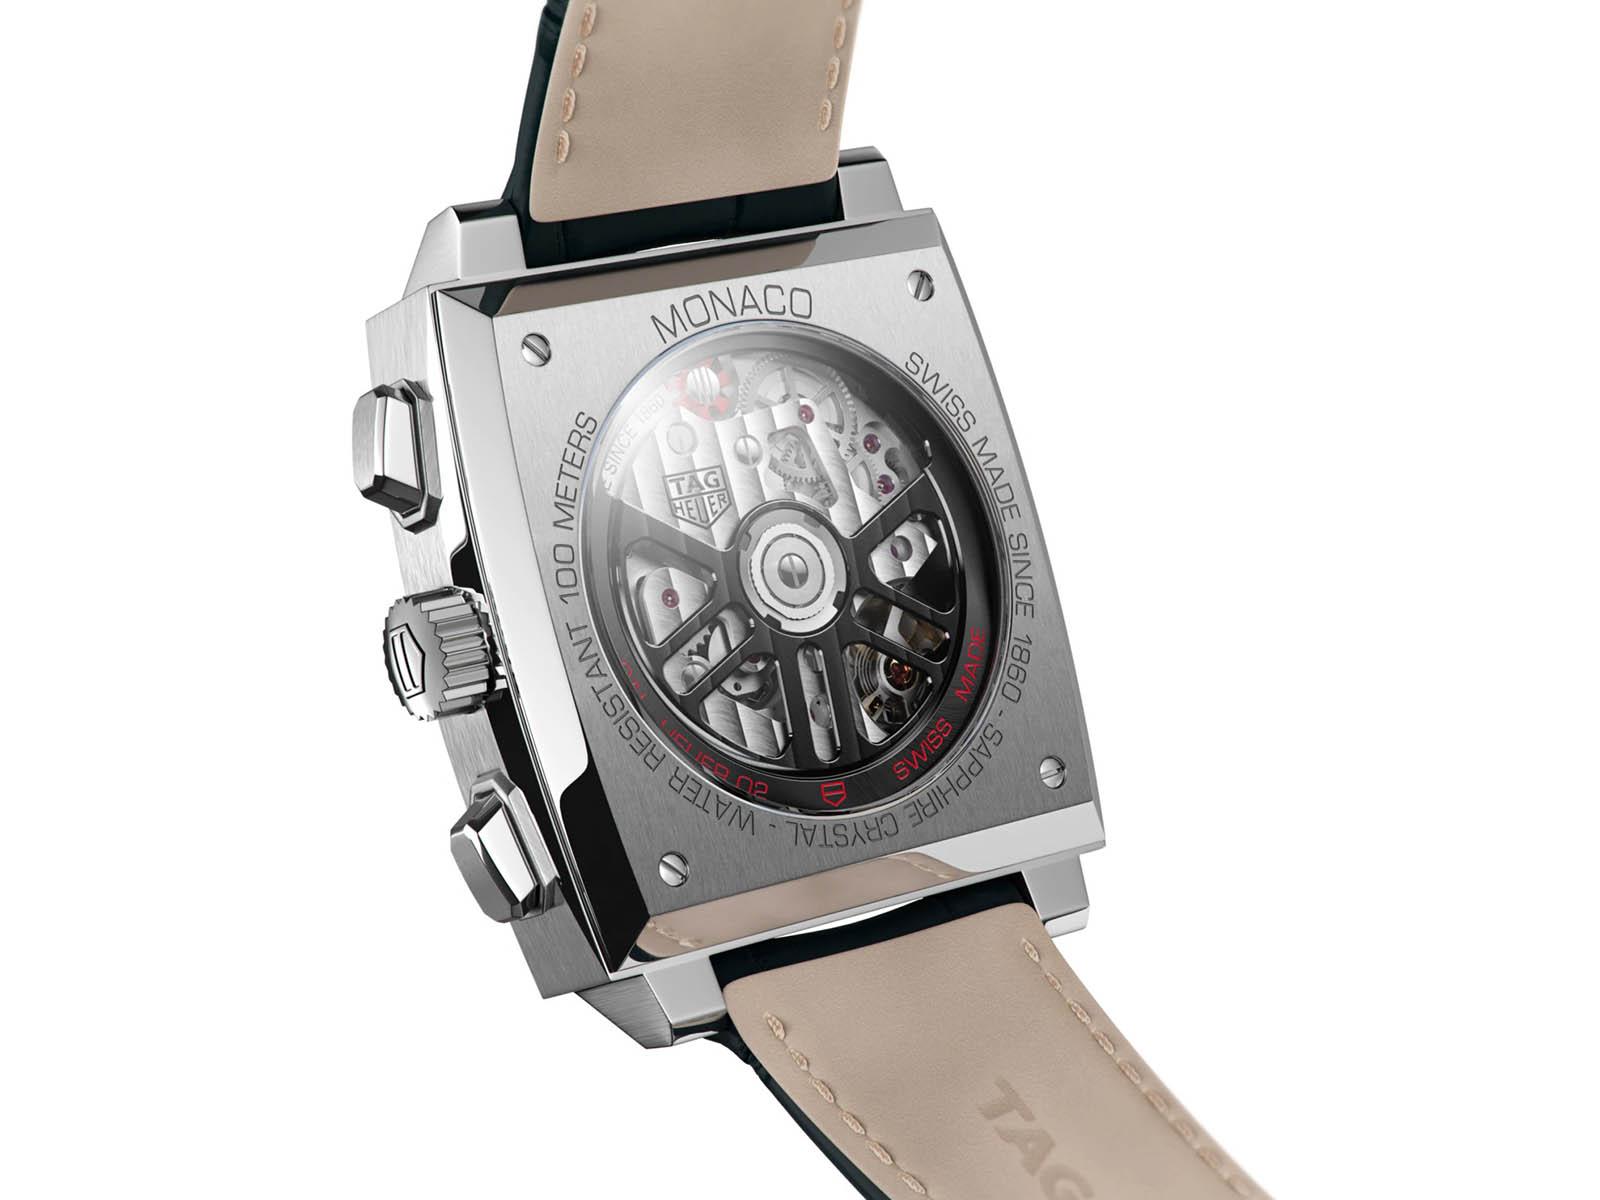 tag-heuer-monaco-chronograph-39mm-calibre-heuer-02-automatic-3.jpg